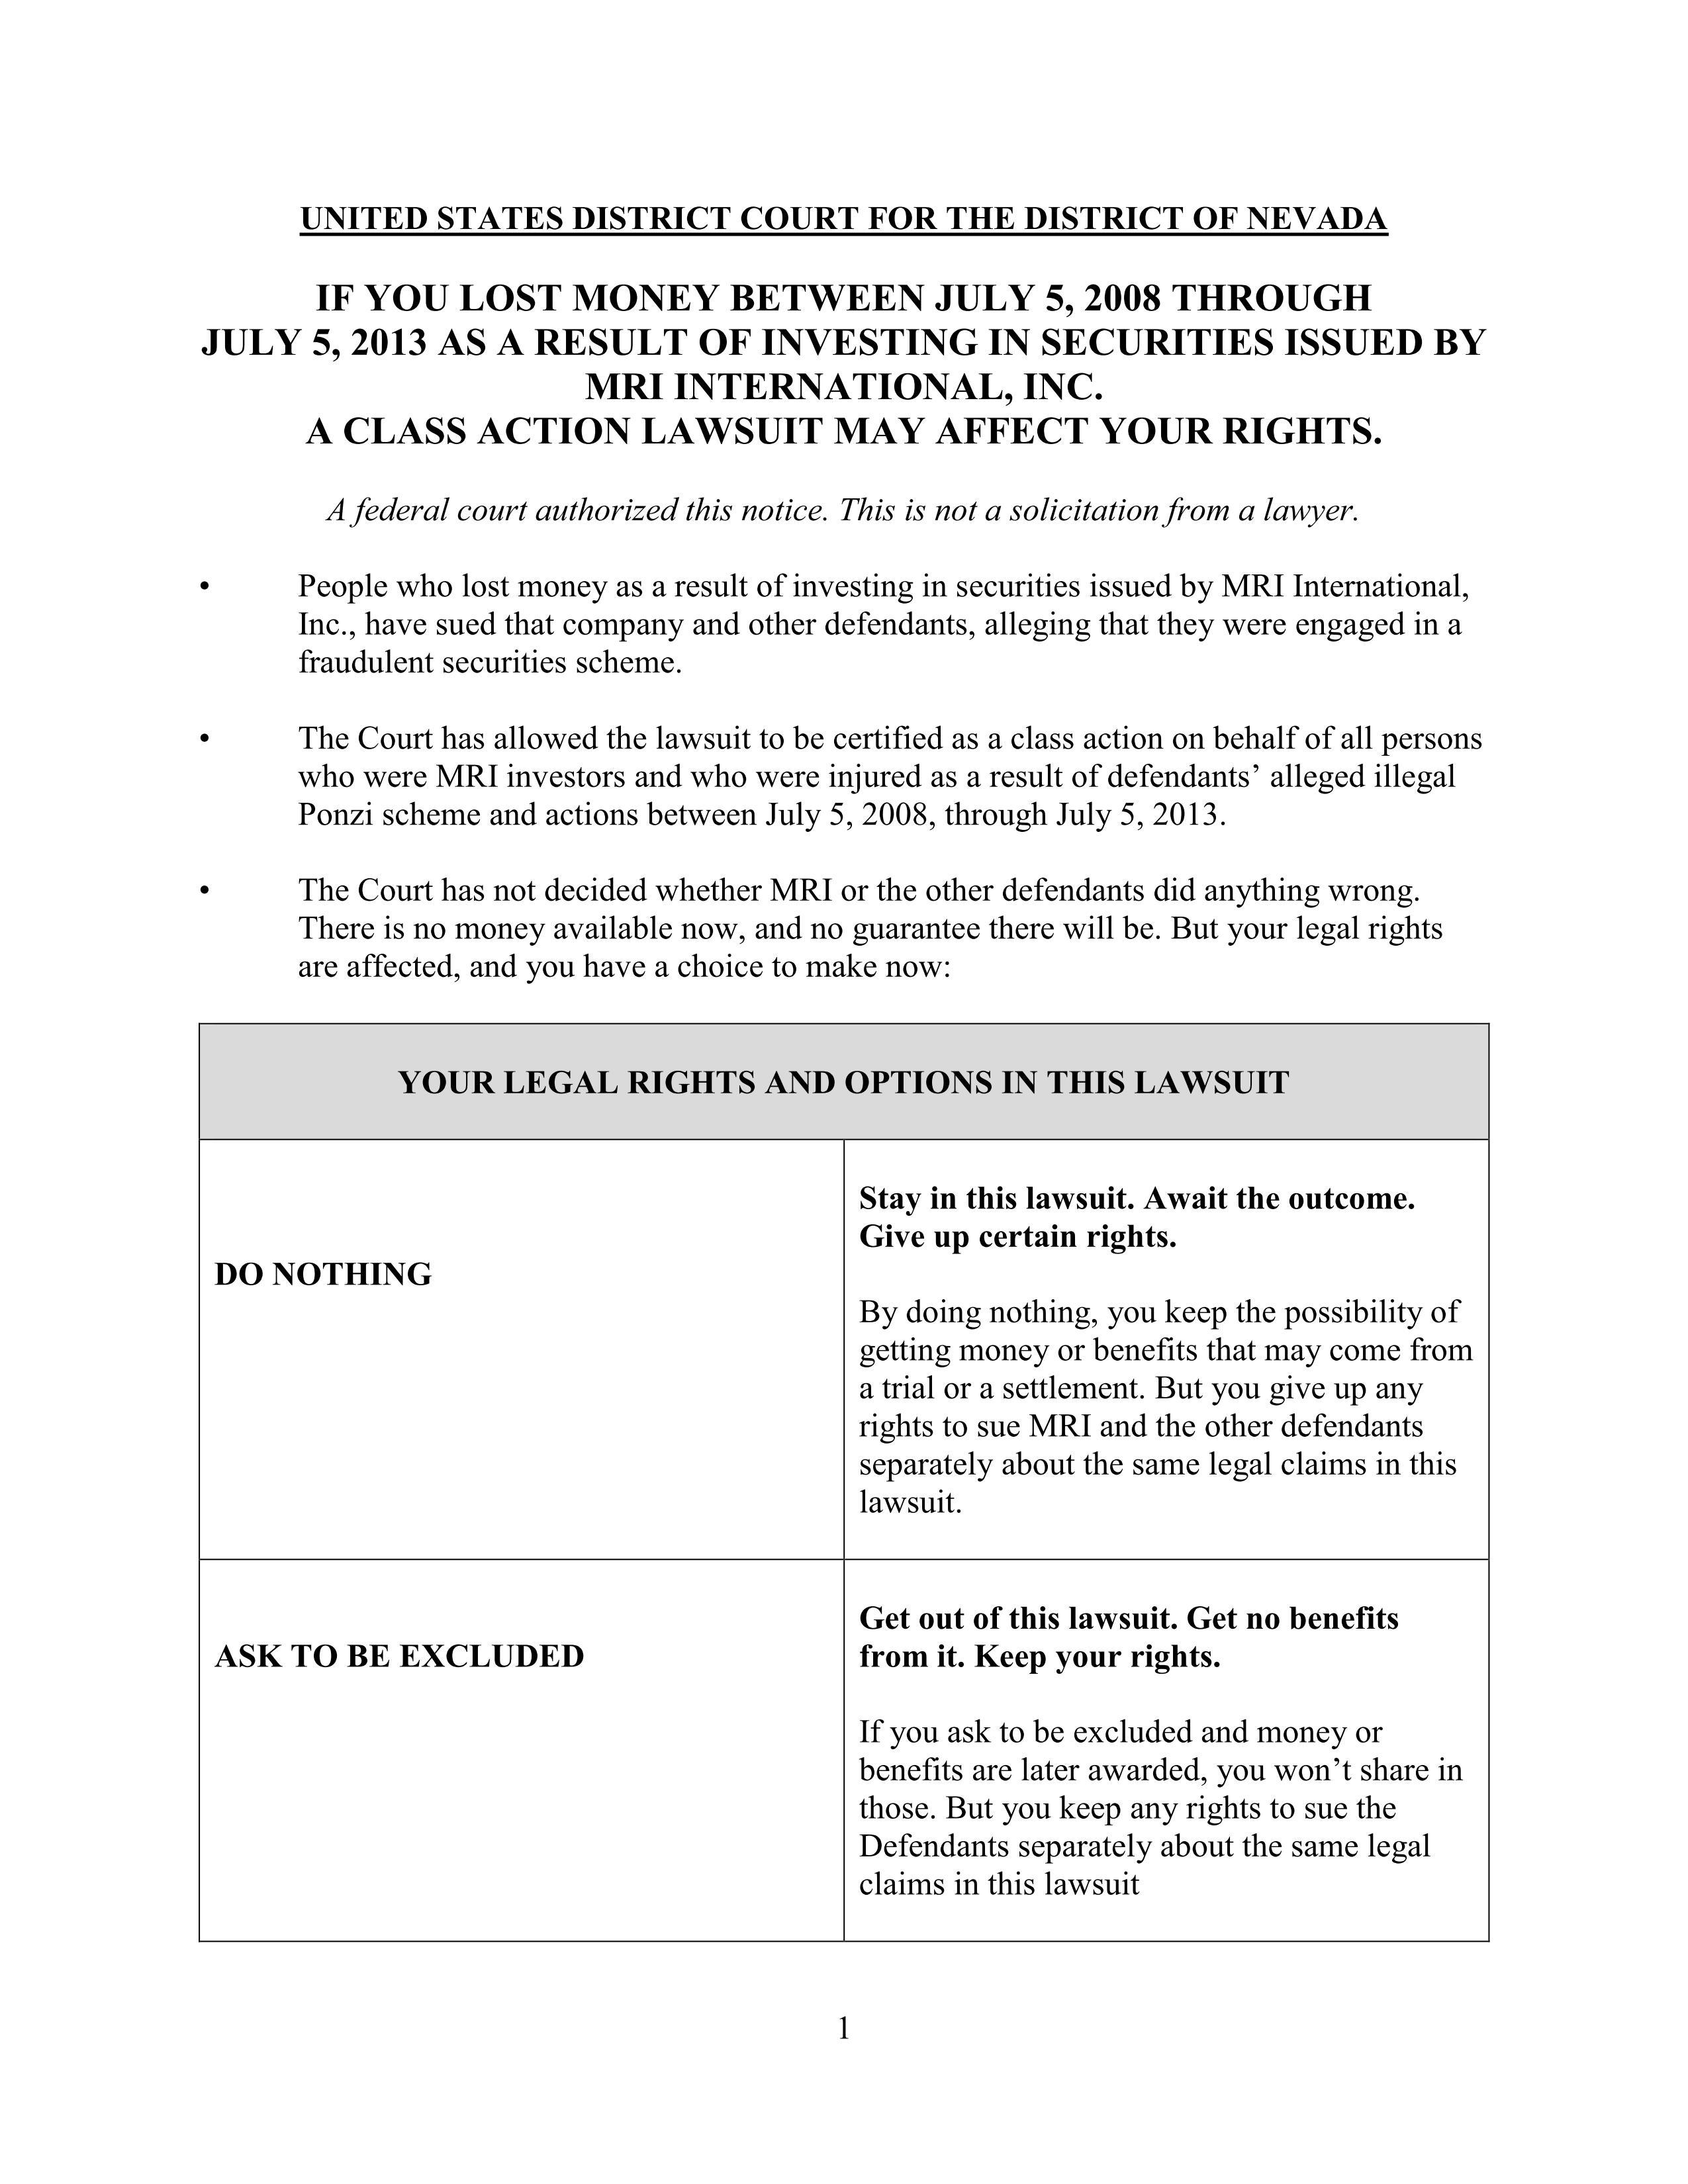 MRI Class Cert Notice_01